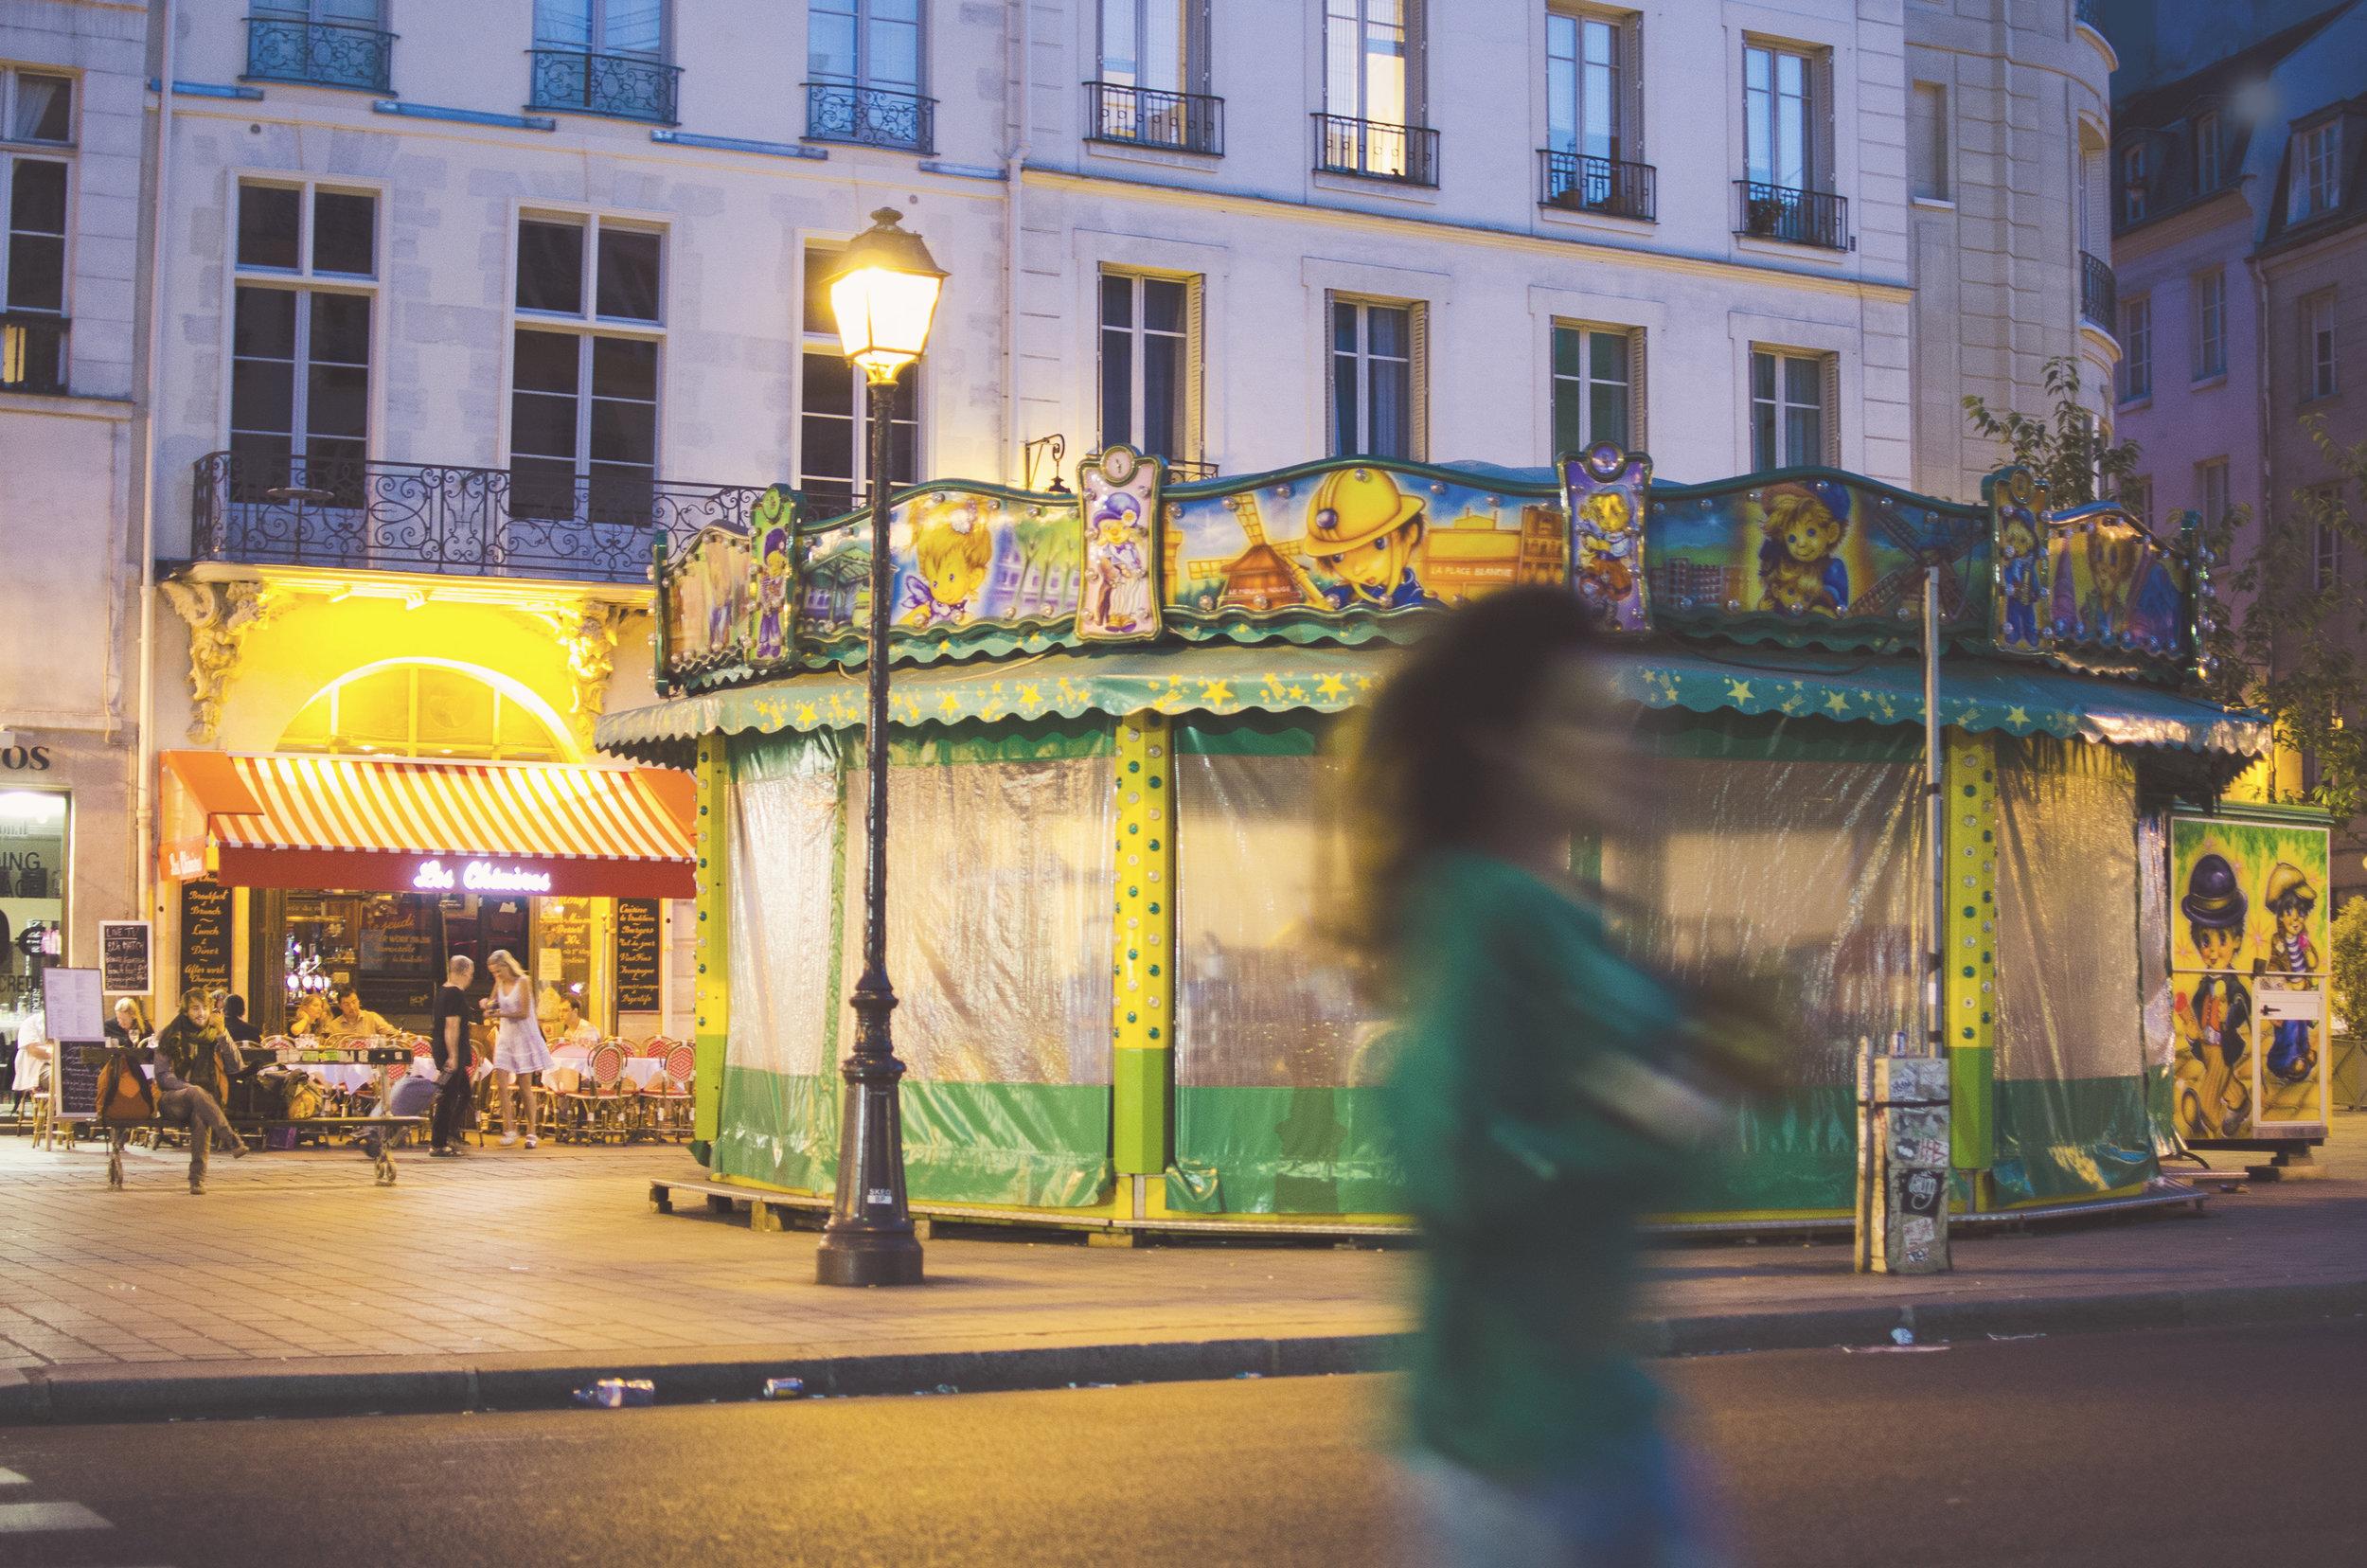 Carousel, Paris by Sam Spahr